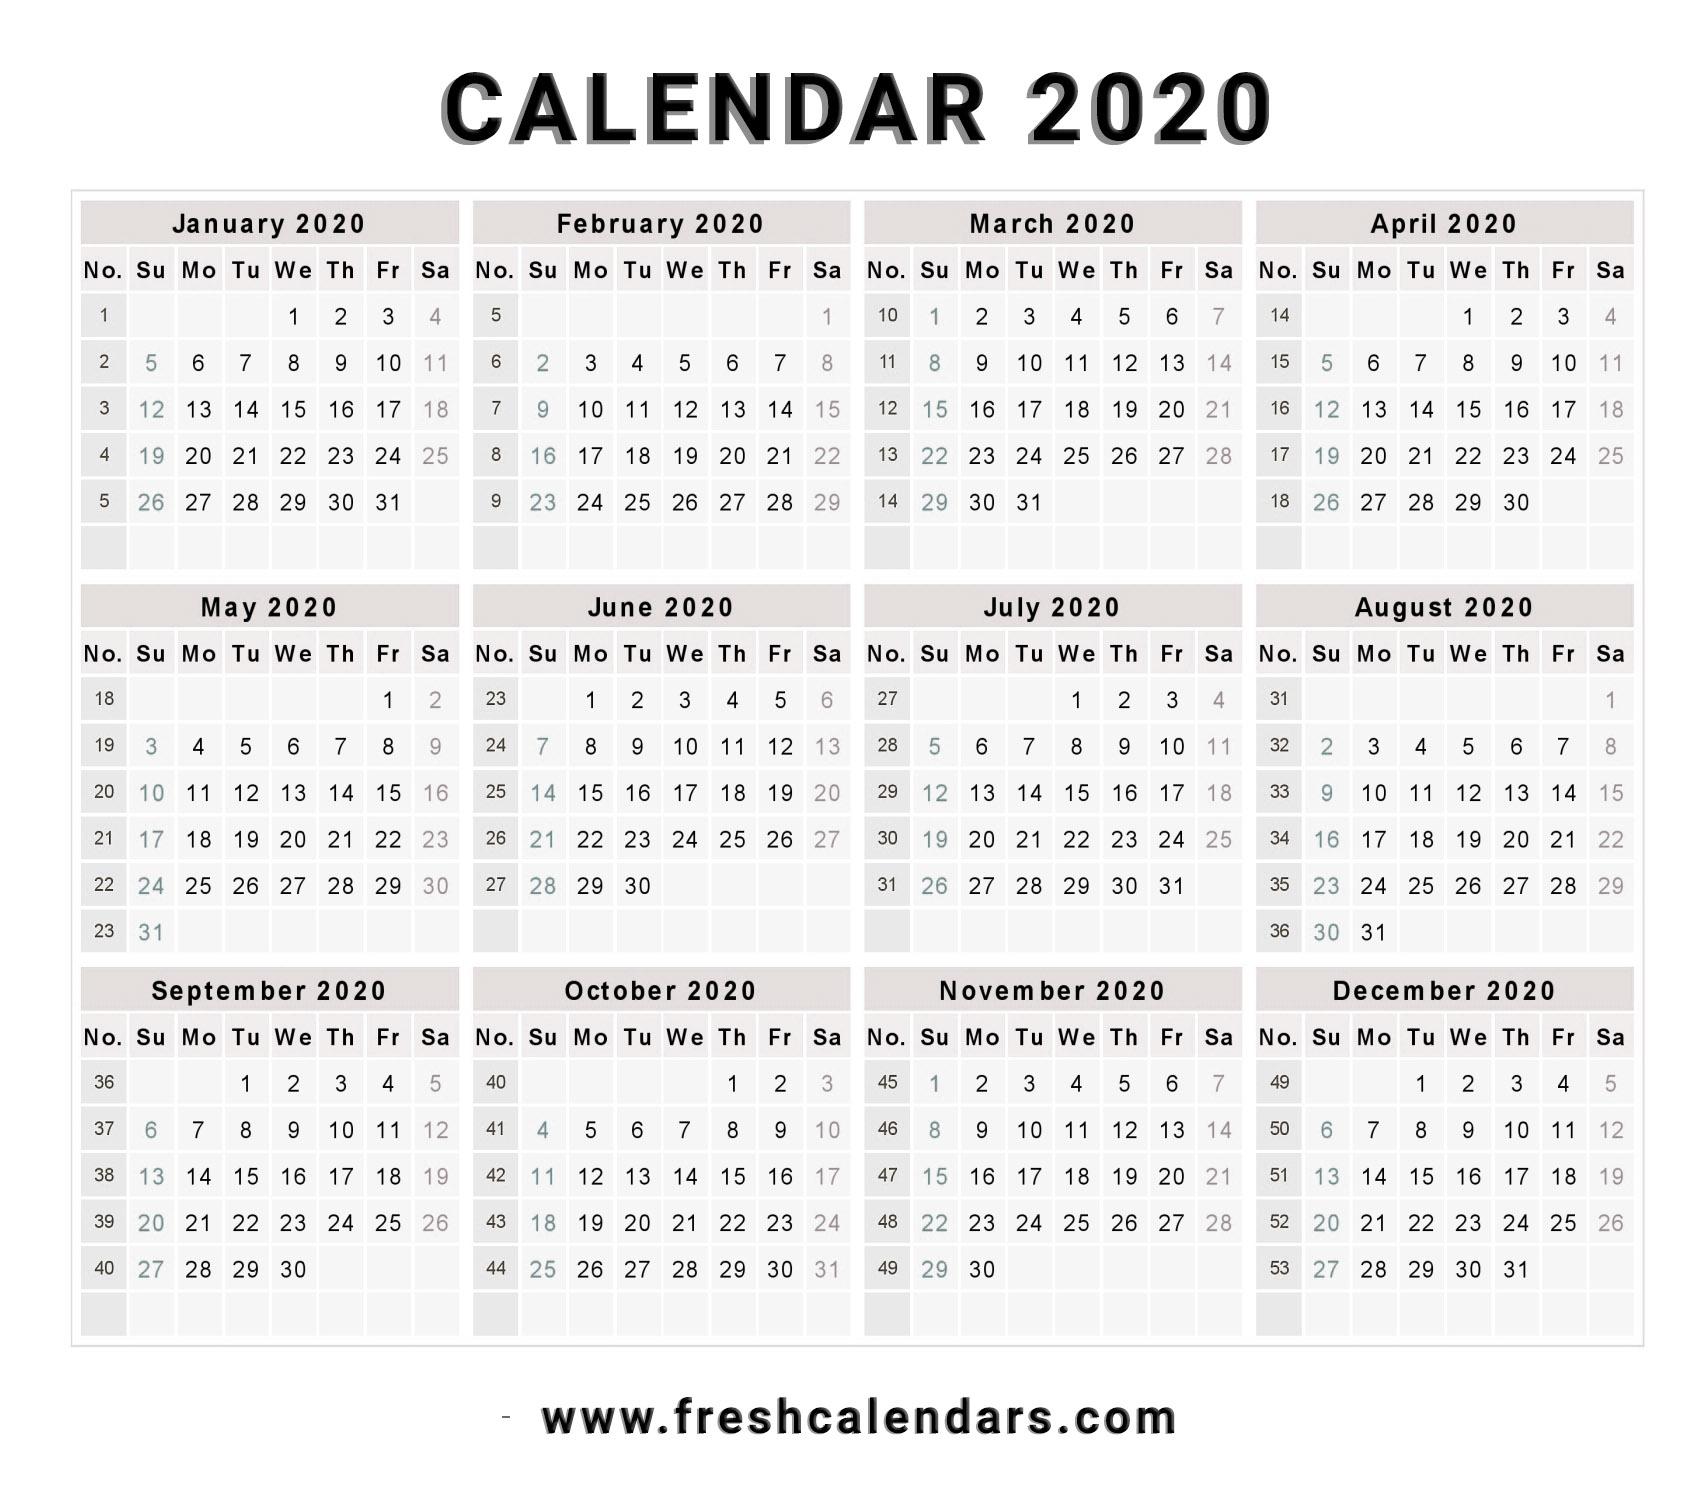 2020 Calendar intended for Printable Calendar 2020 Monday To Sunday